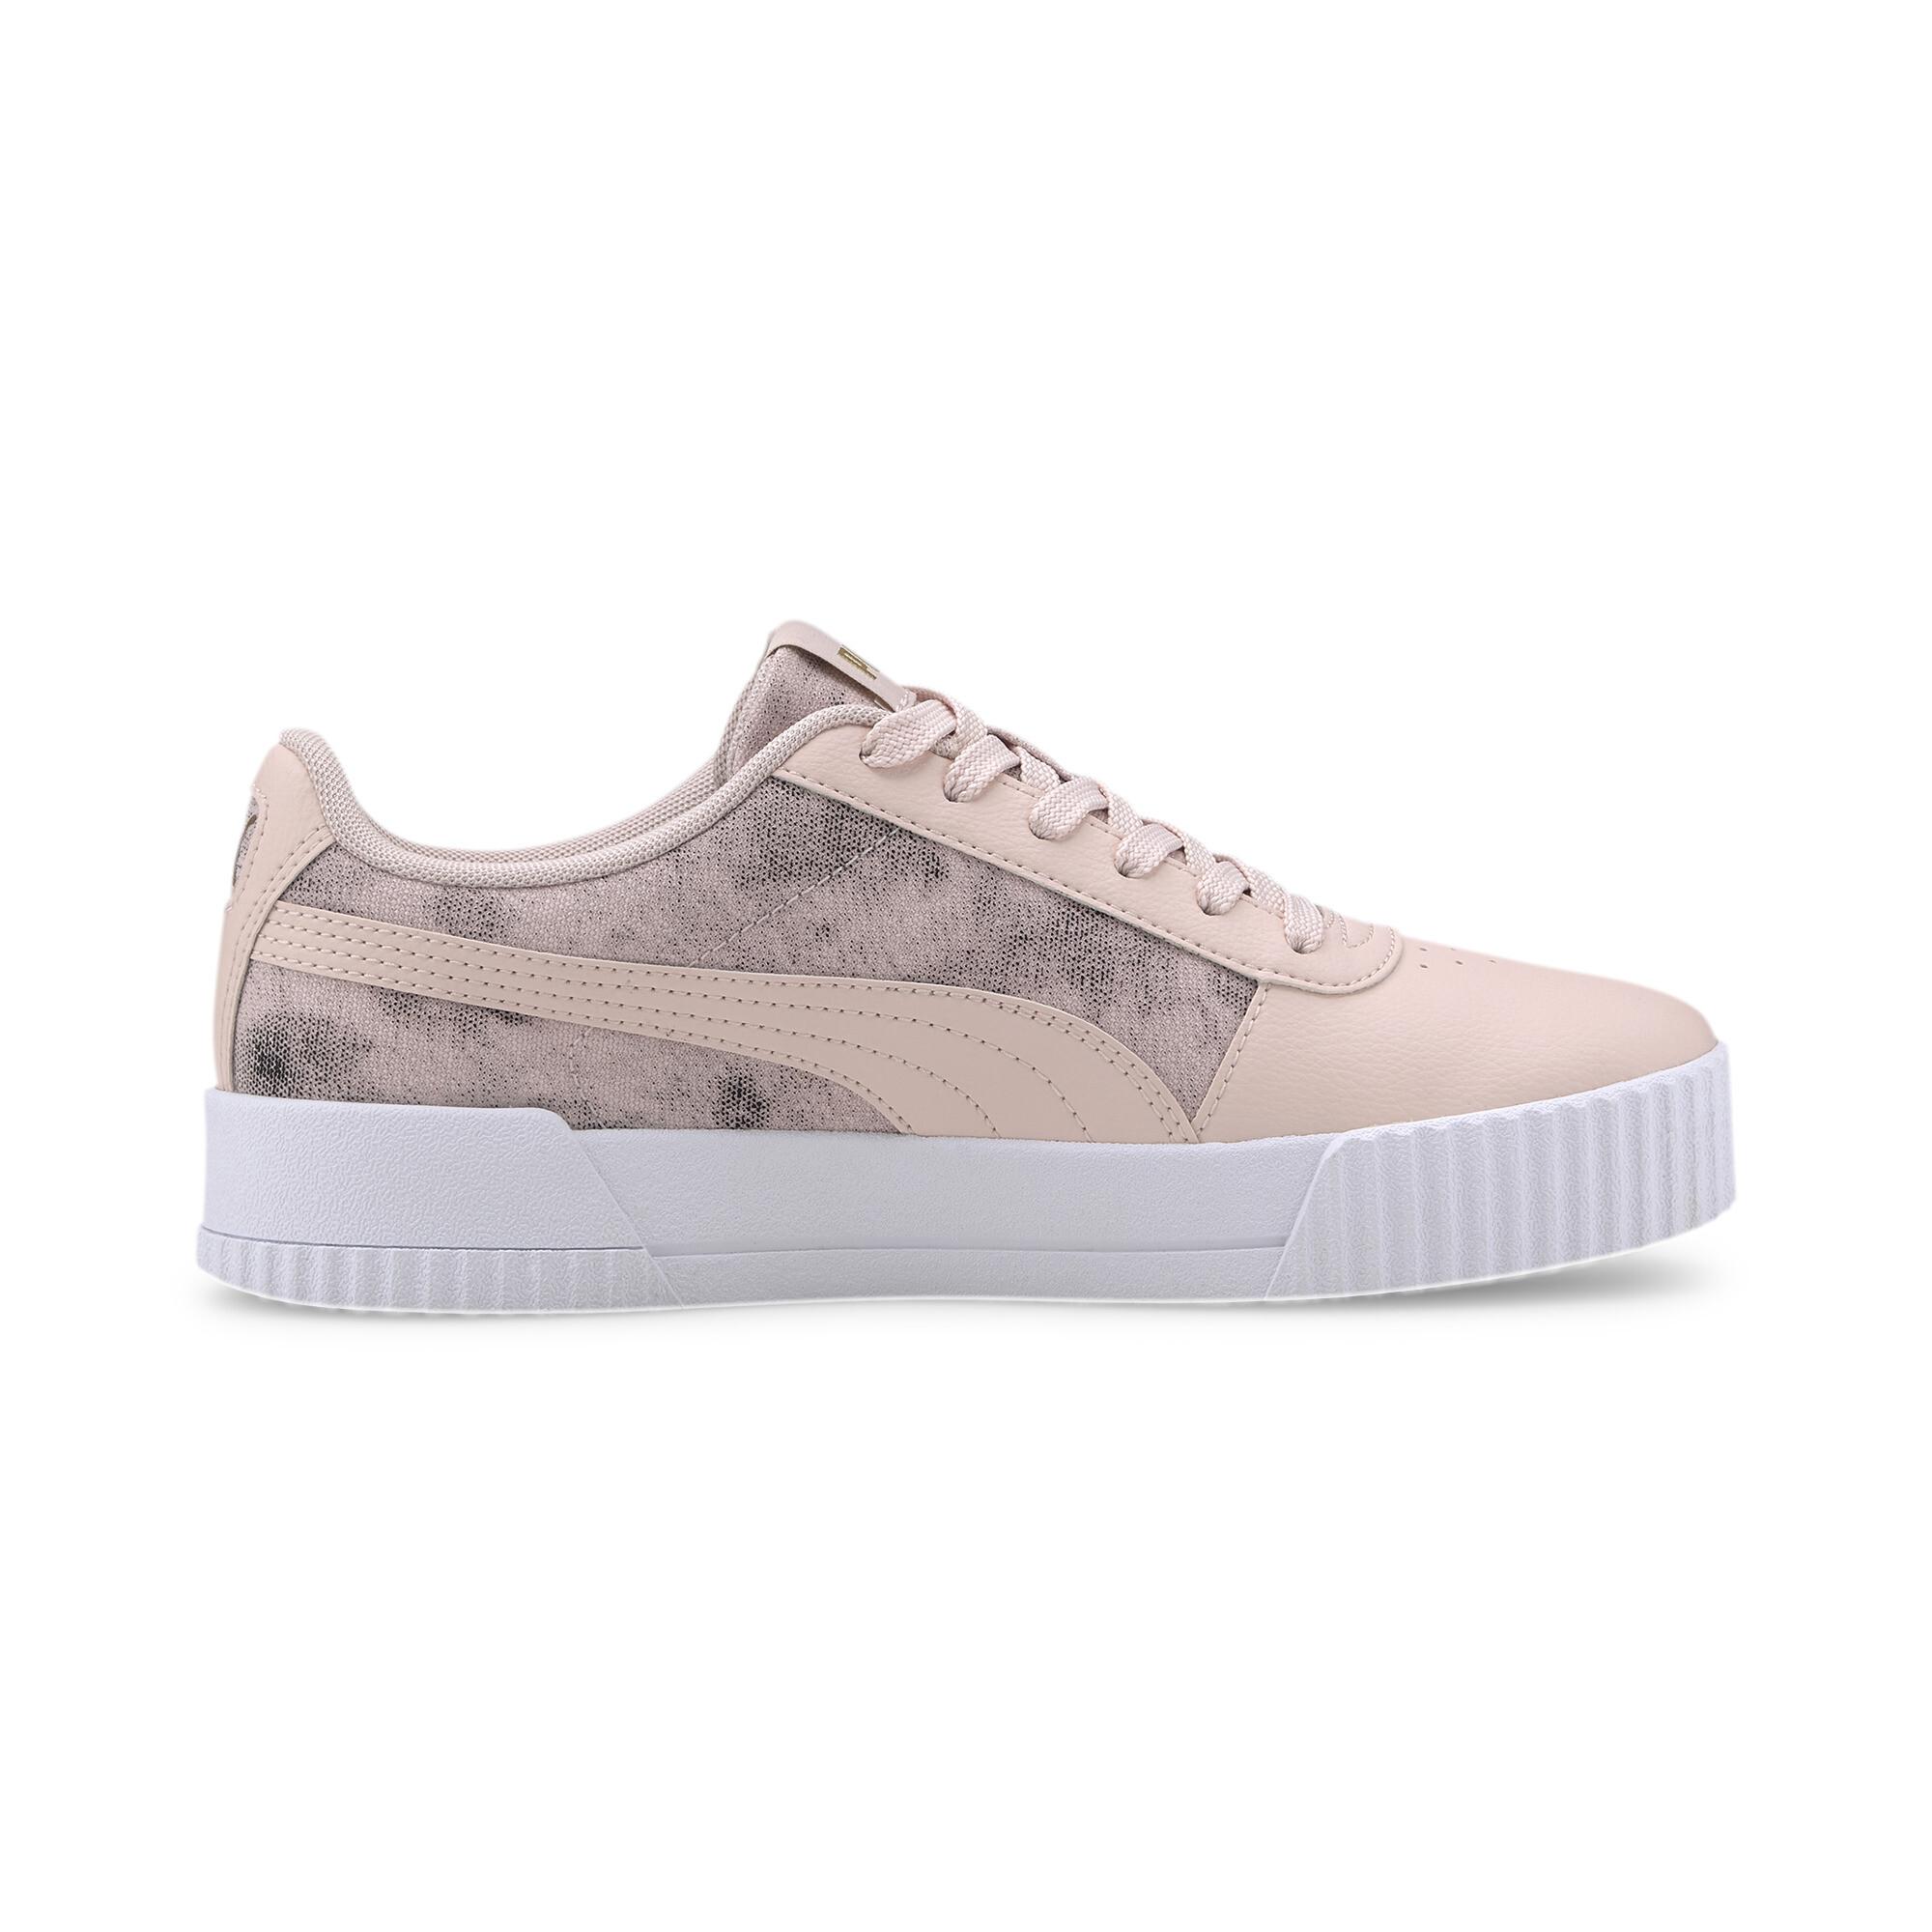 PUMA-Women-039-s-Carina-Tie-Dye-Sneakers thumbnail 7